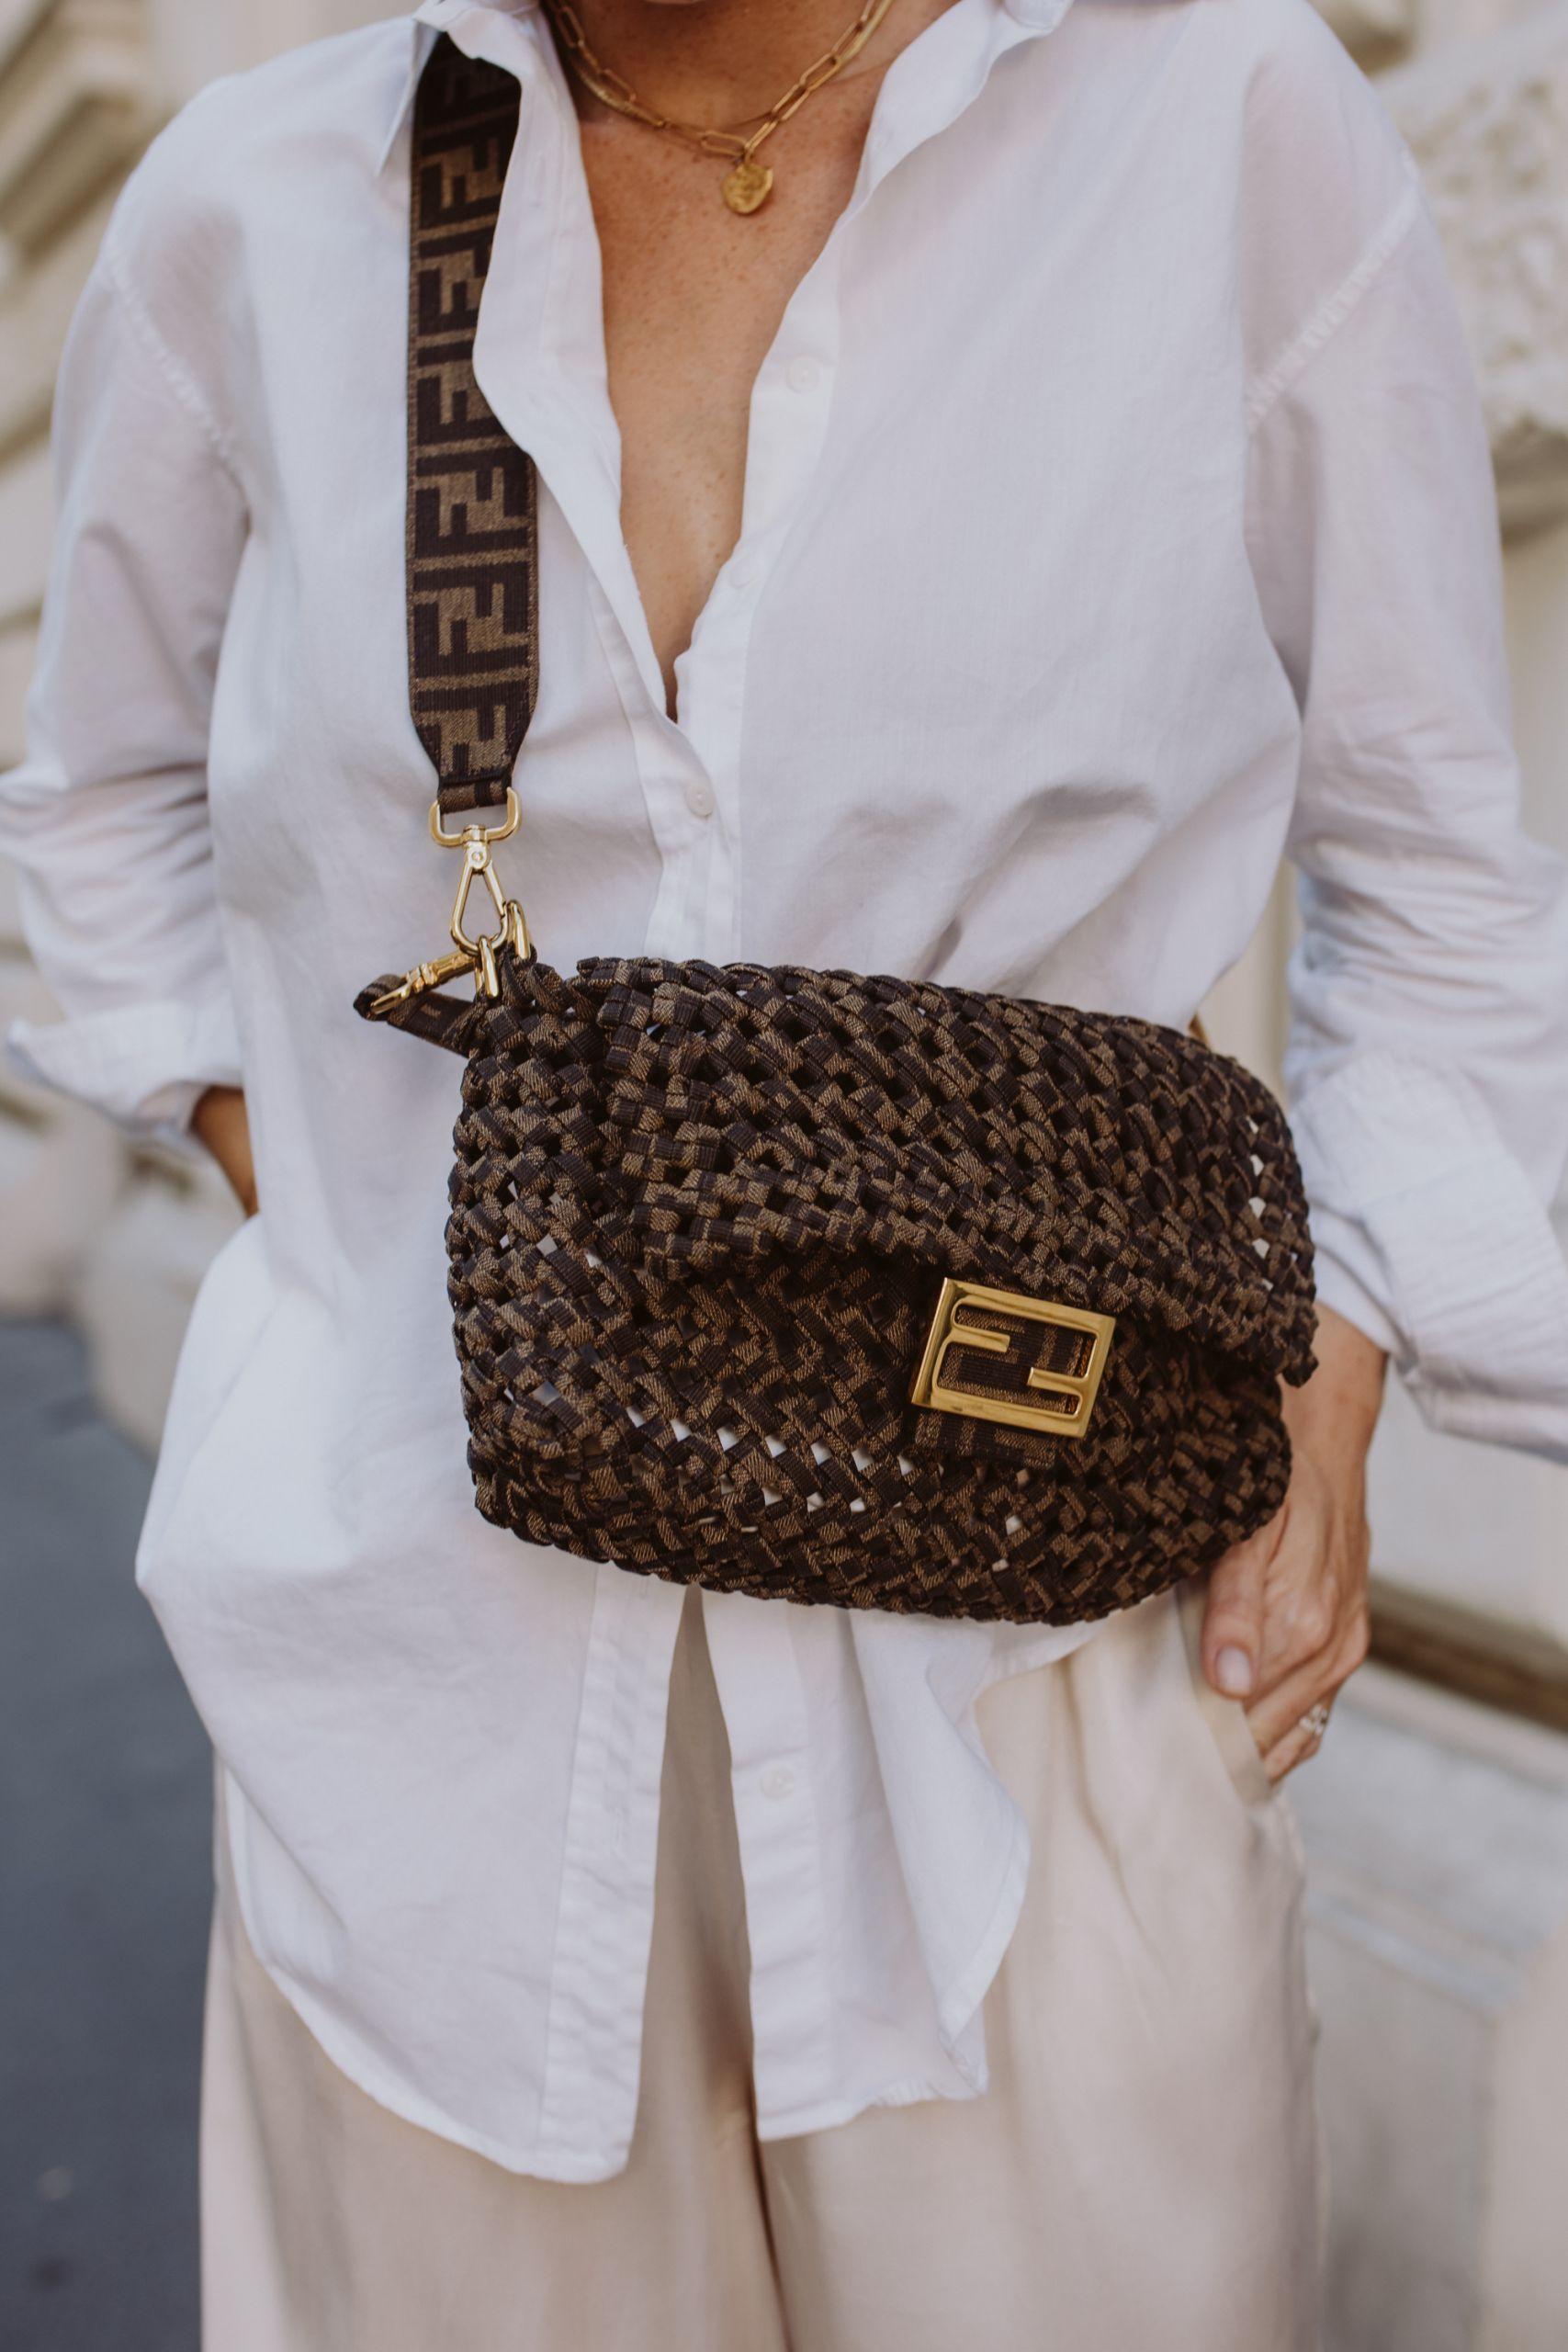 Jacquard fabric interlace bag